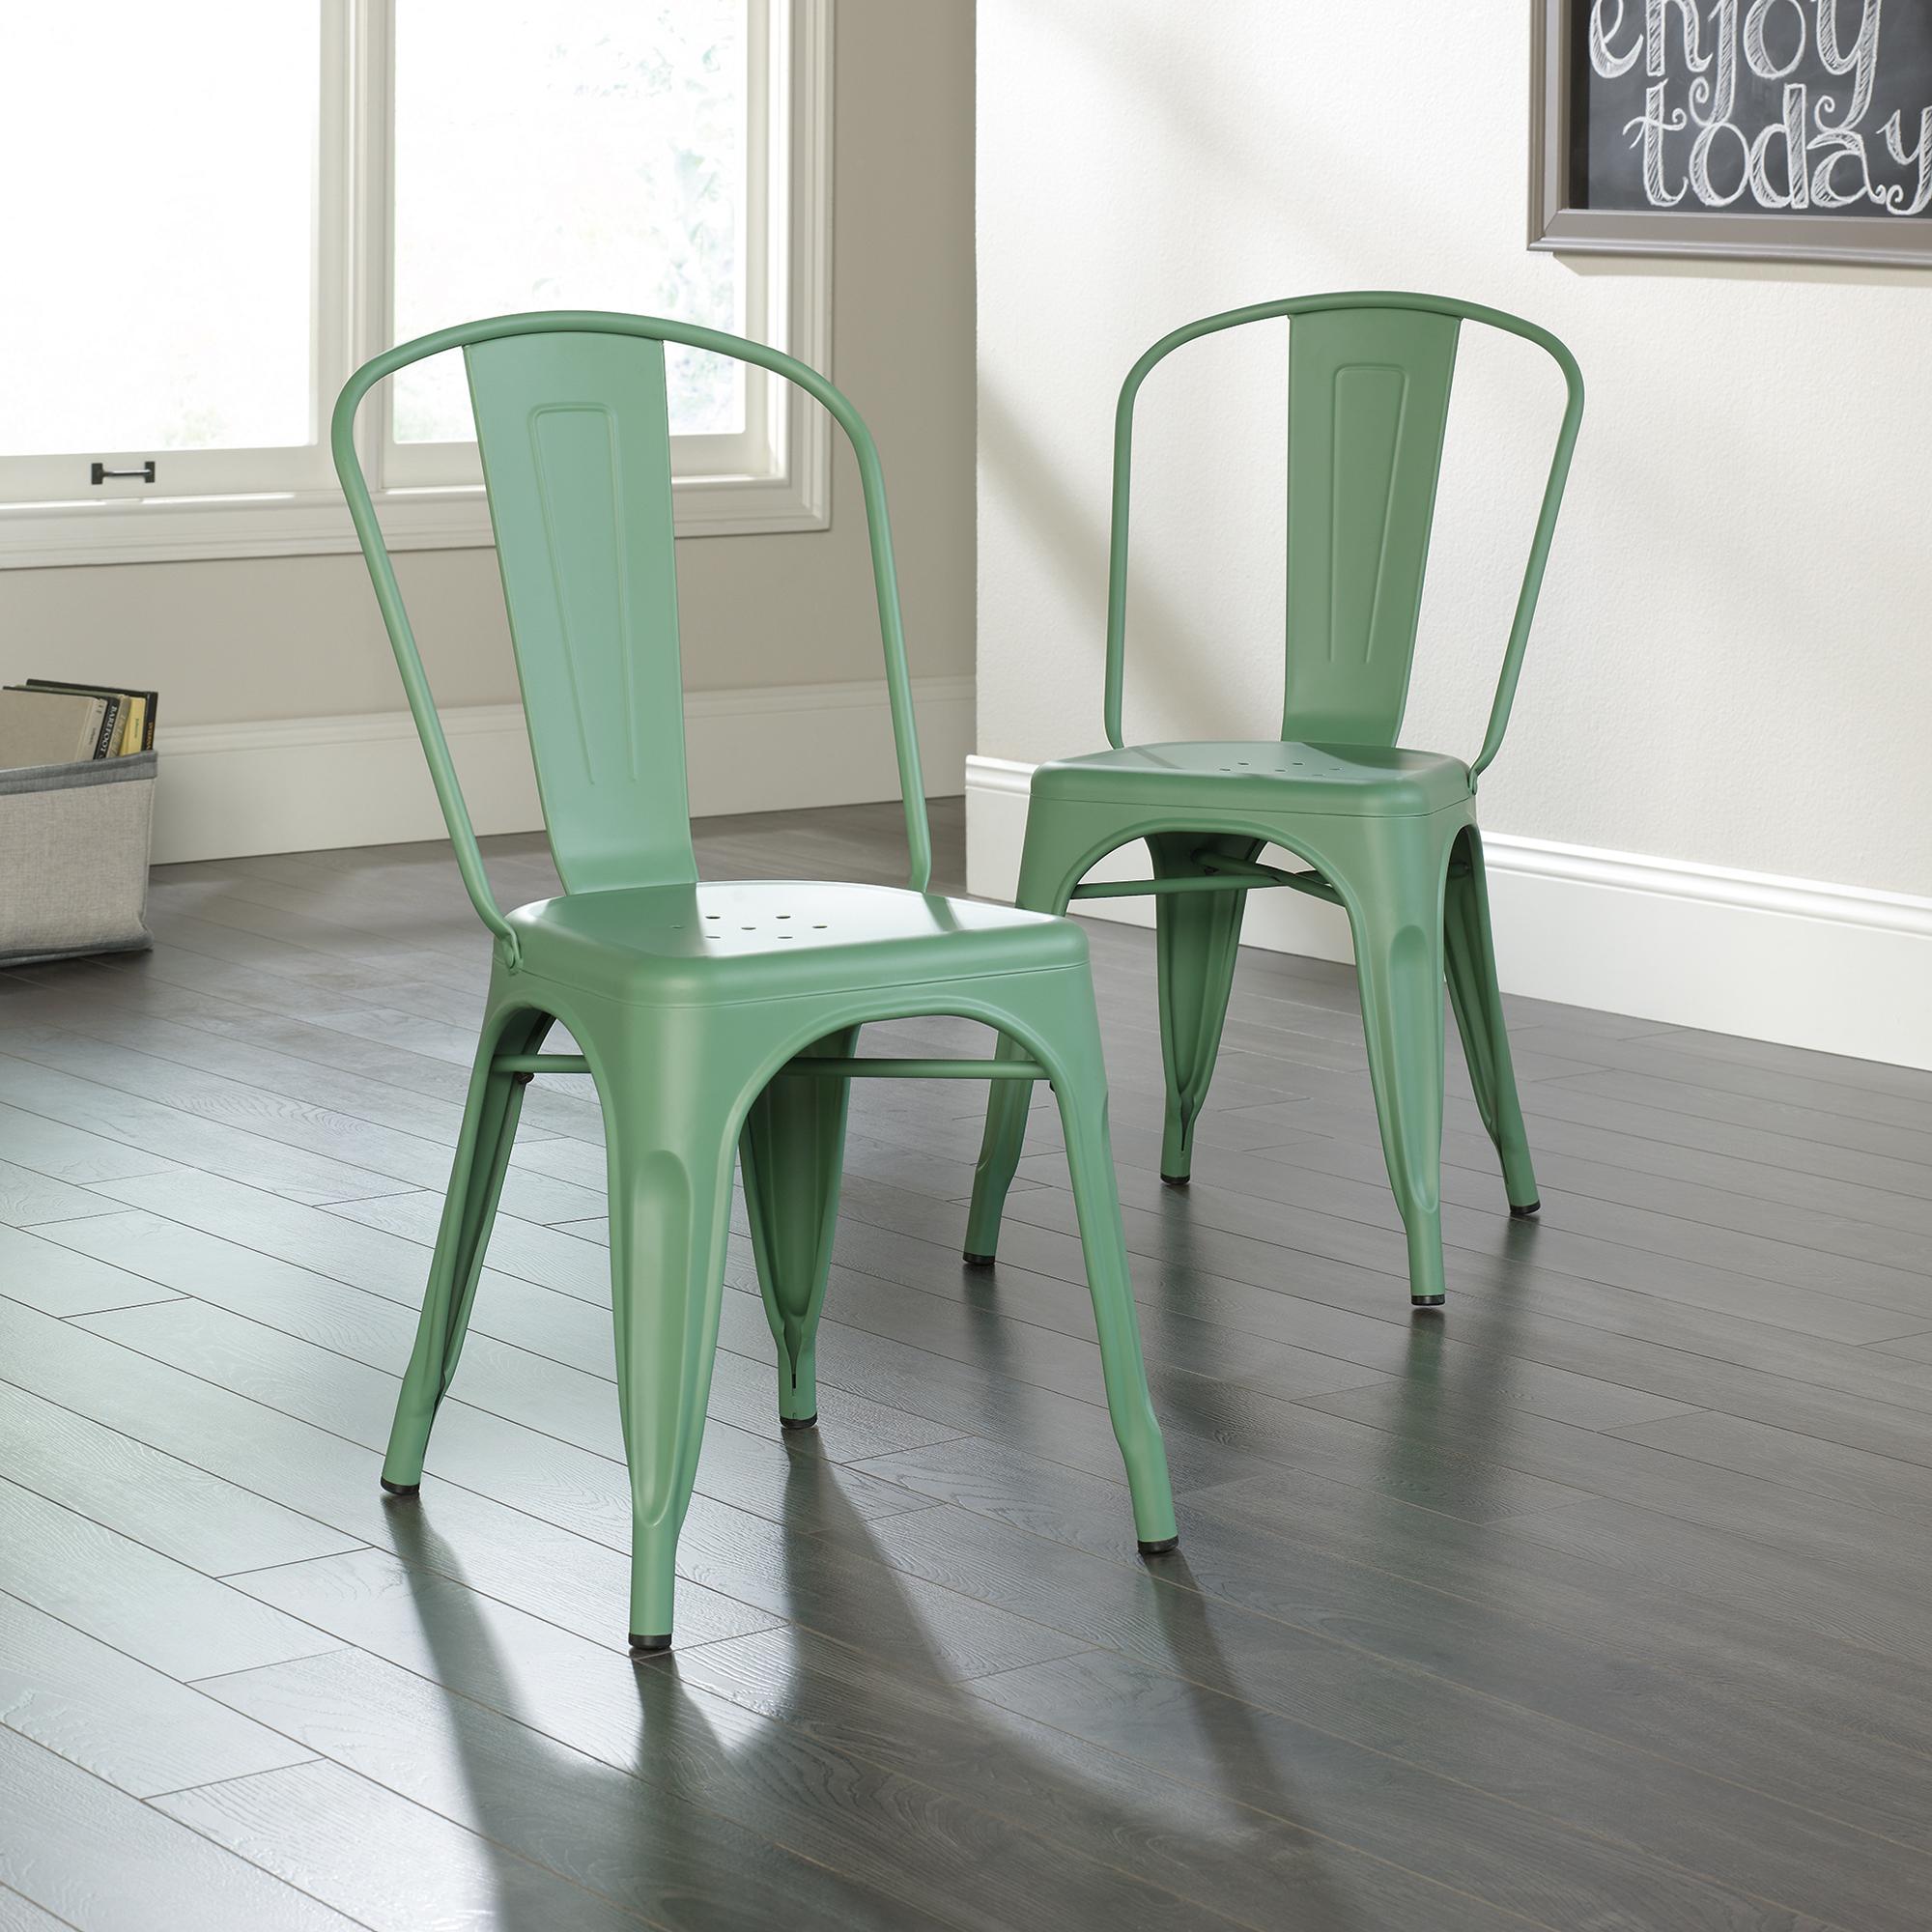 Sauder New Grange Metal Dining Chairs, Light Green Finish - Set of 2